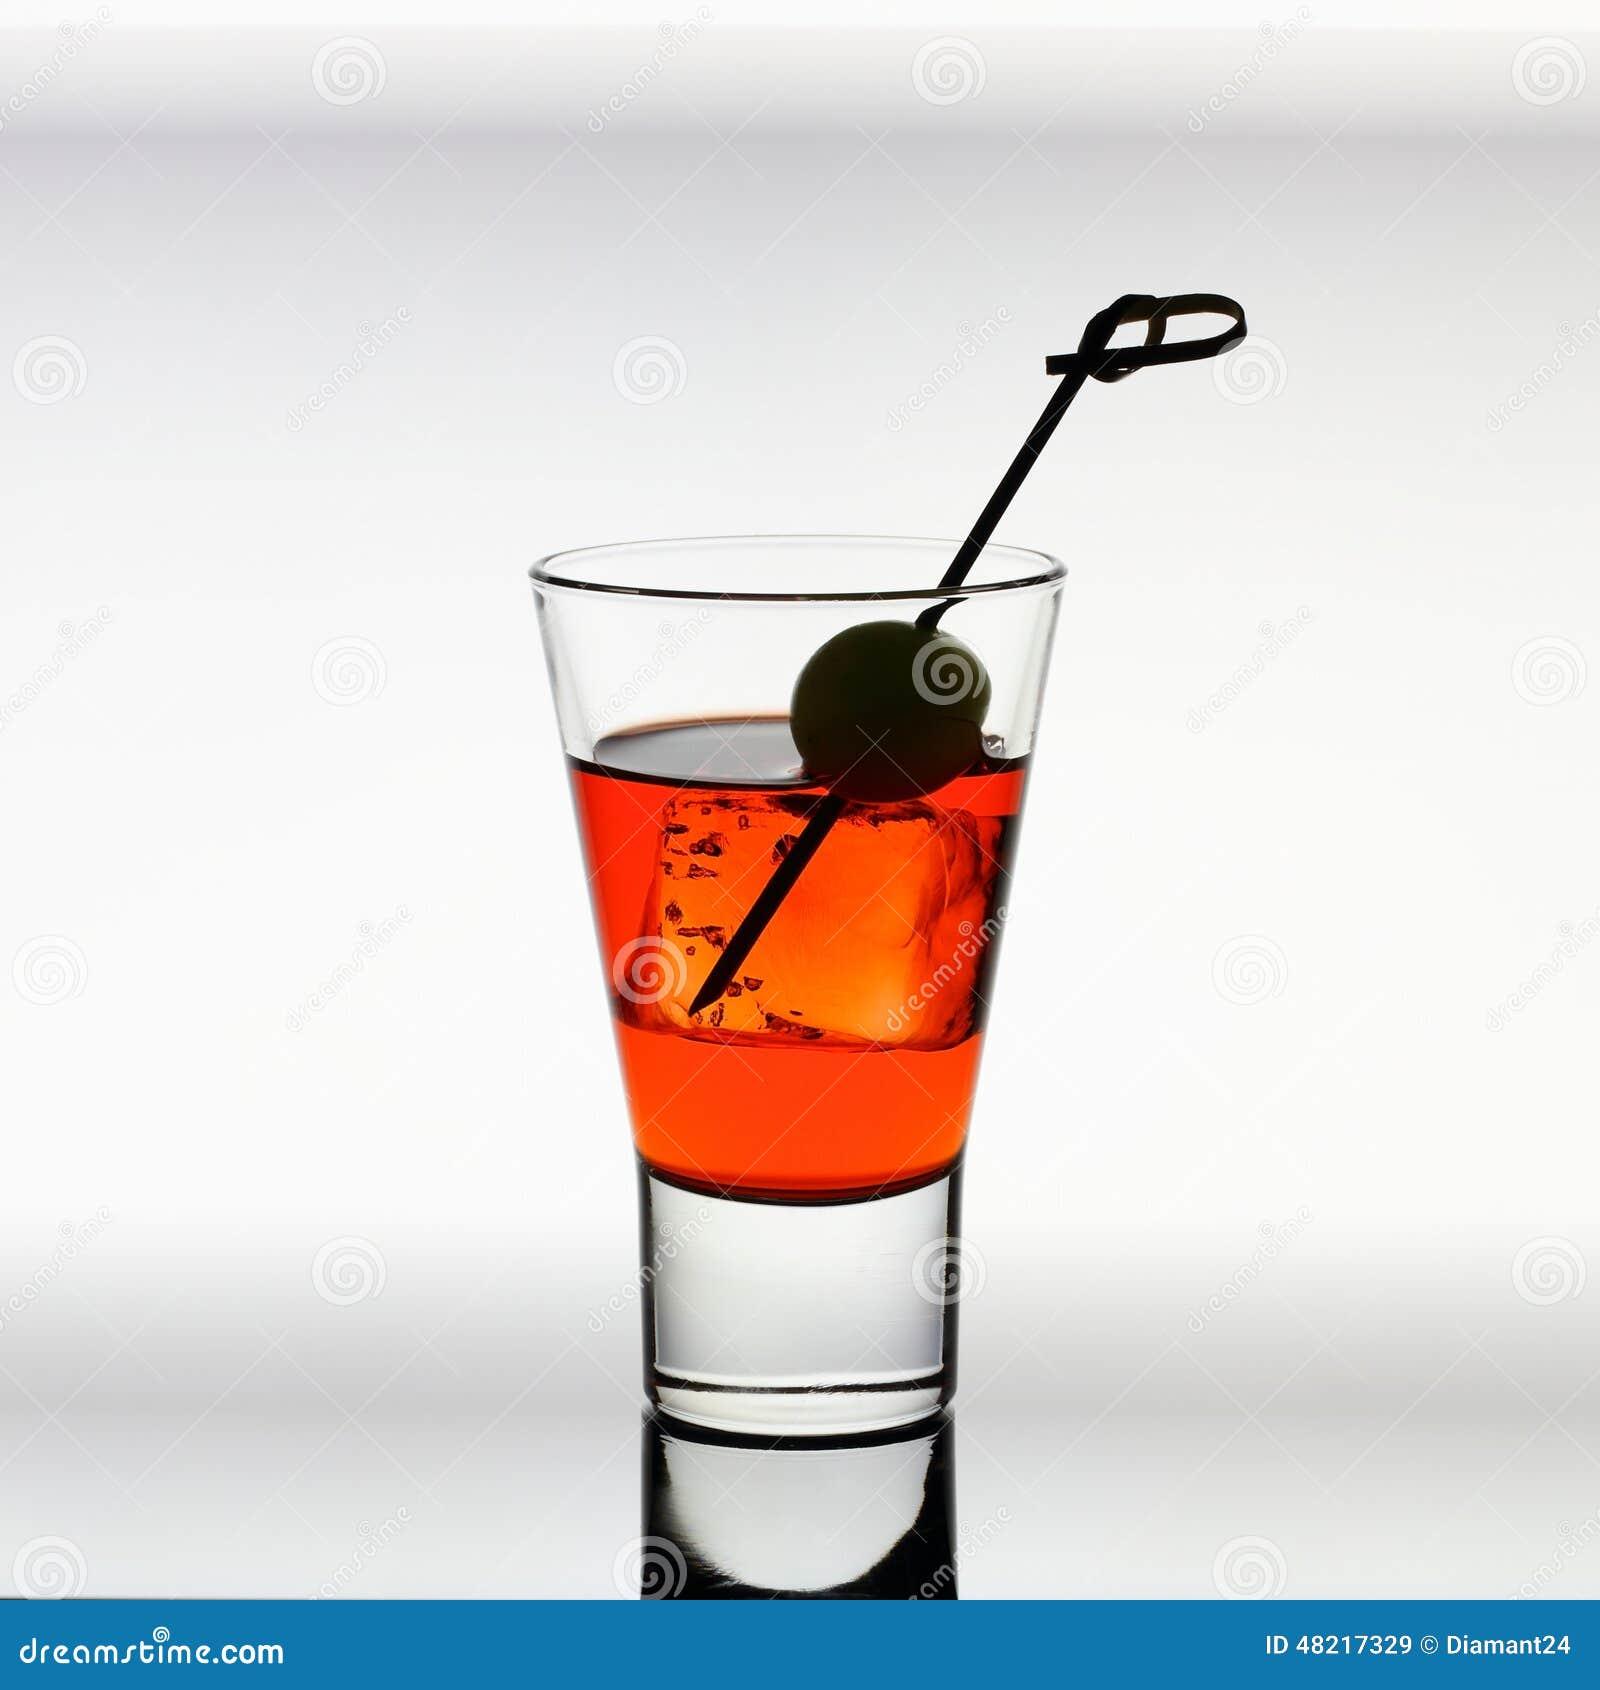 Liquid X Alcoholic Drink